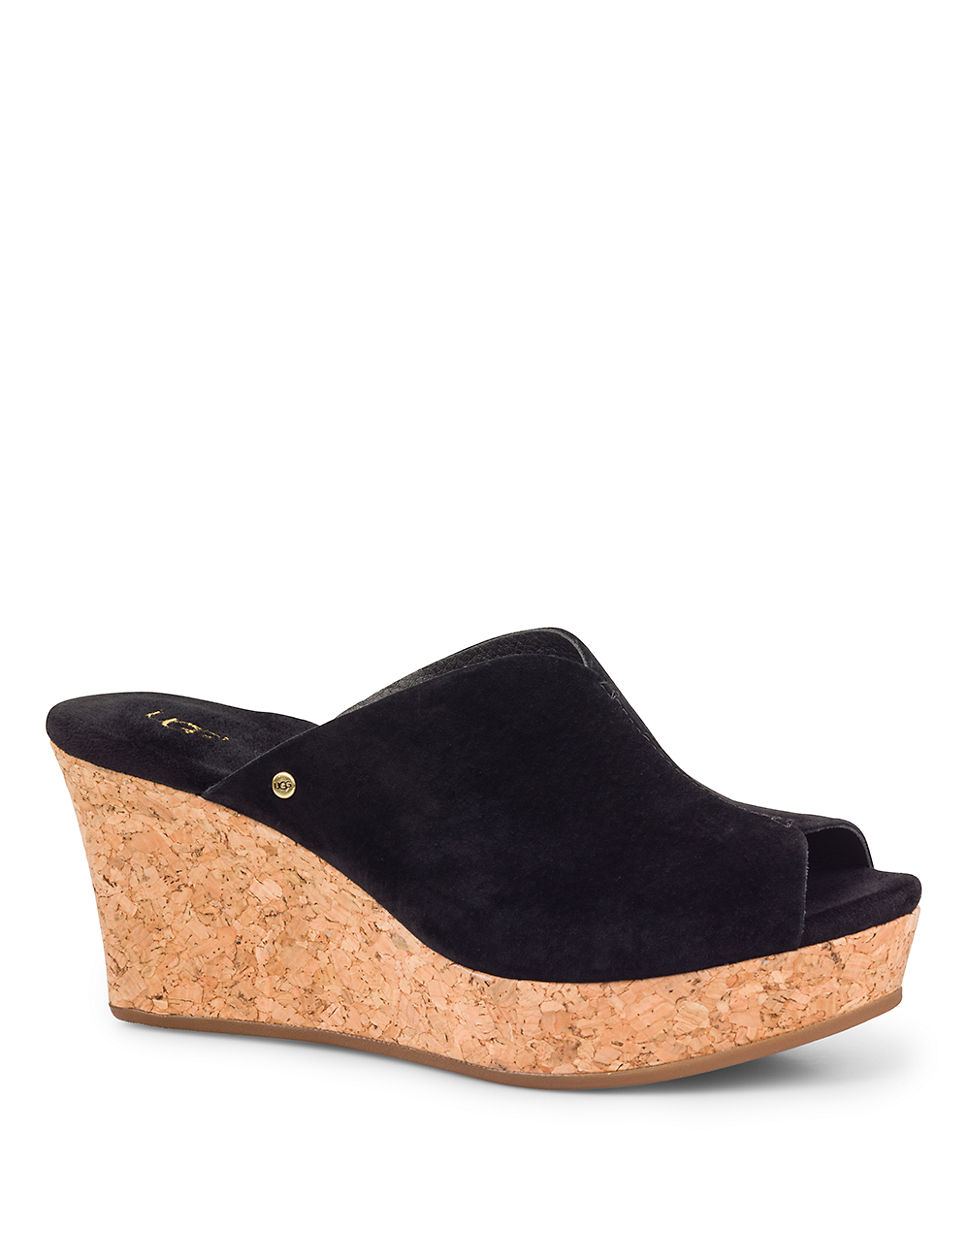 Open Toe Suede Shoes Heels Platform Black